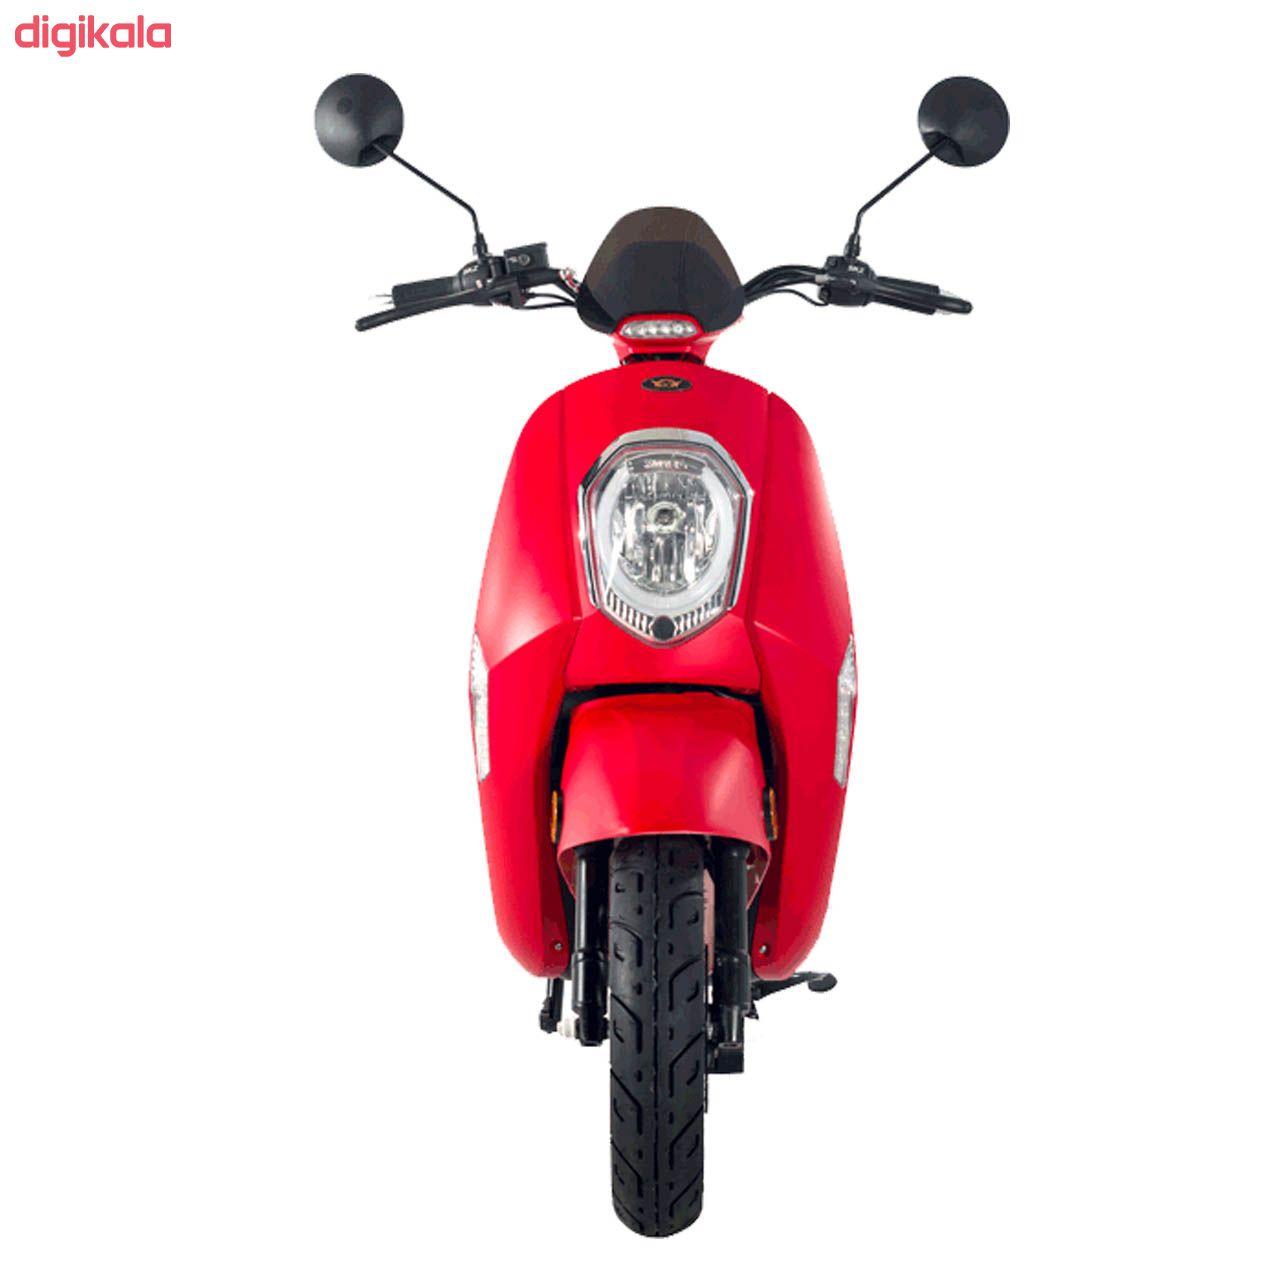 موتورسیکلت سپهر مدل 1600SKZ وات سال 1399 main 1 3